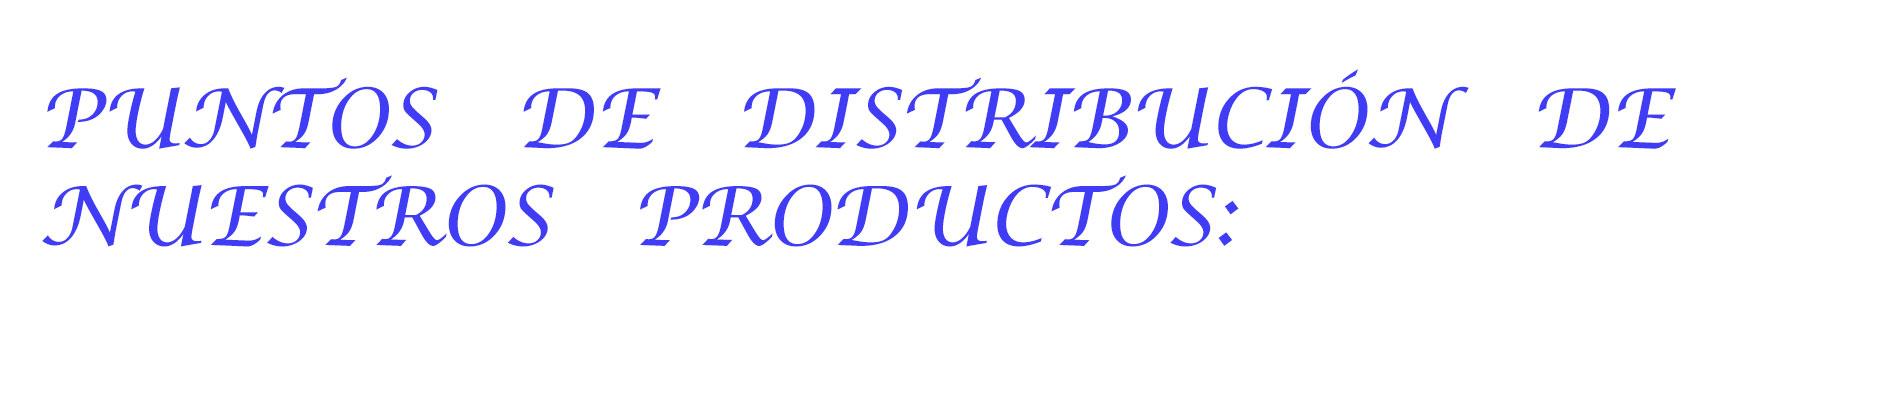 TEXTO-DISTRIBUCION-PRODUCTOS